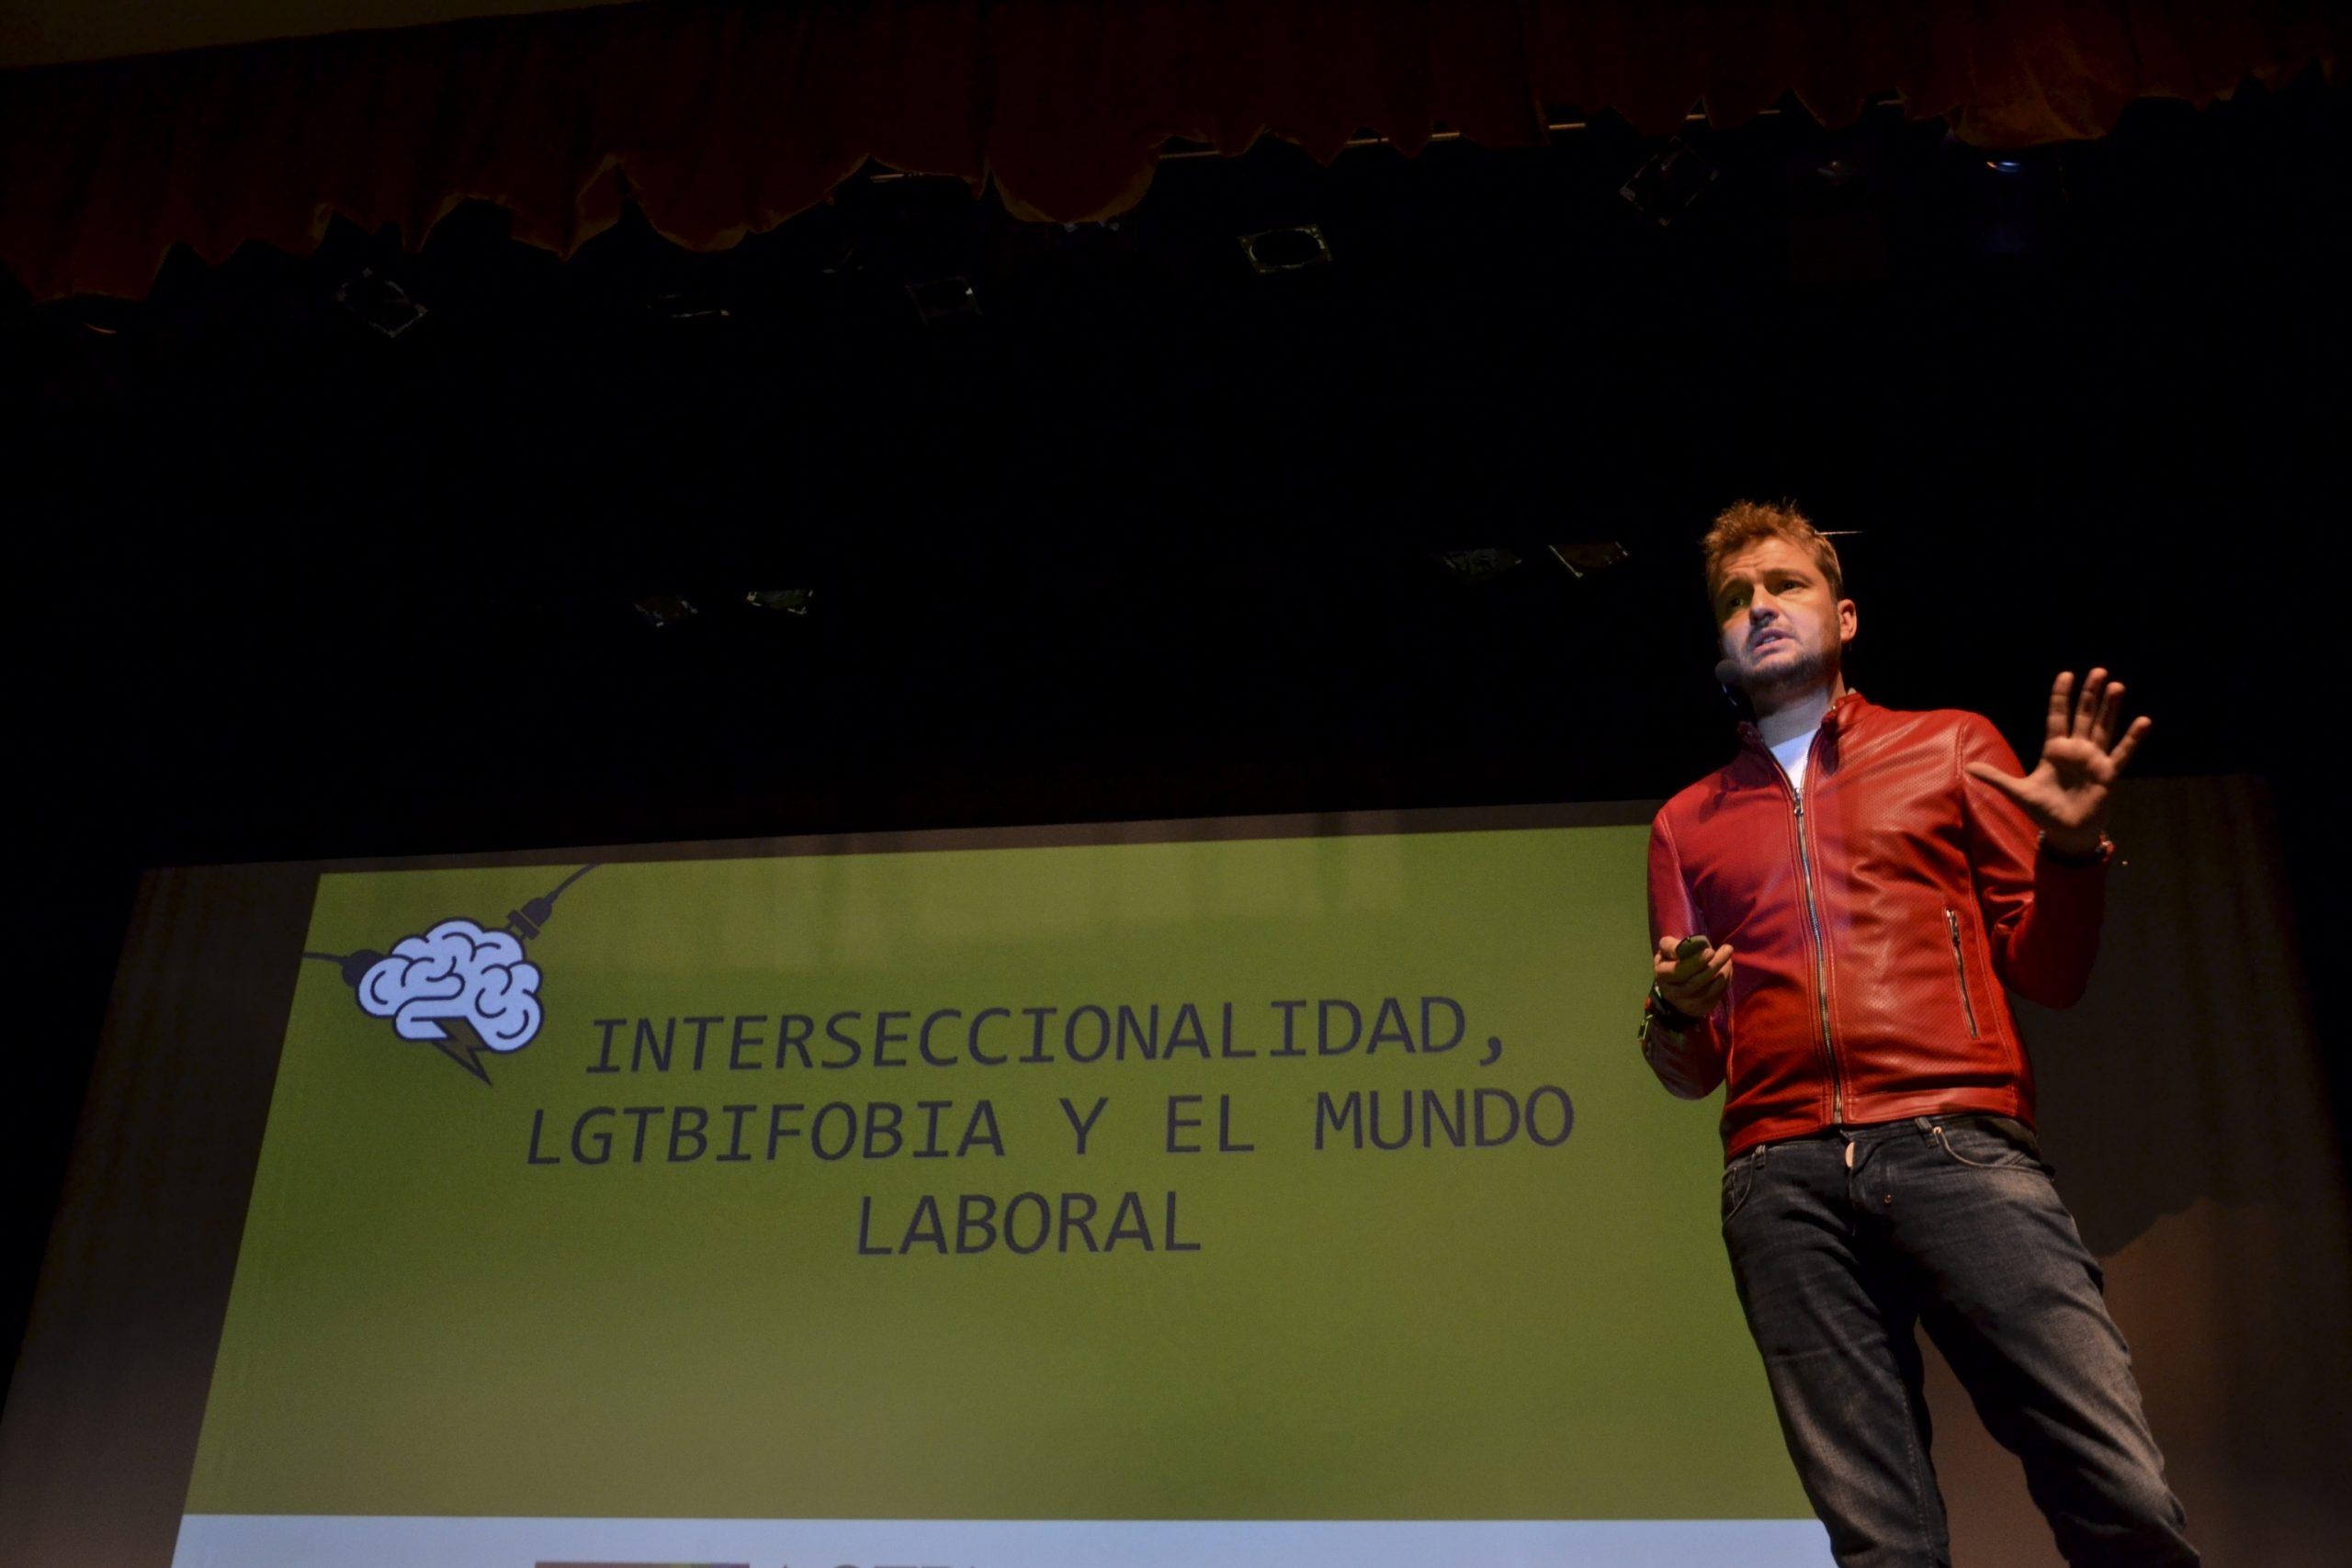 Jornadas-Mejorada-2018-Isidro-García-11-scaled